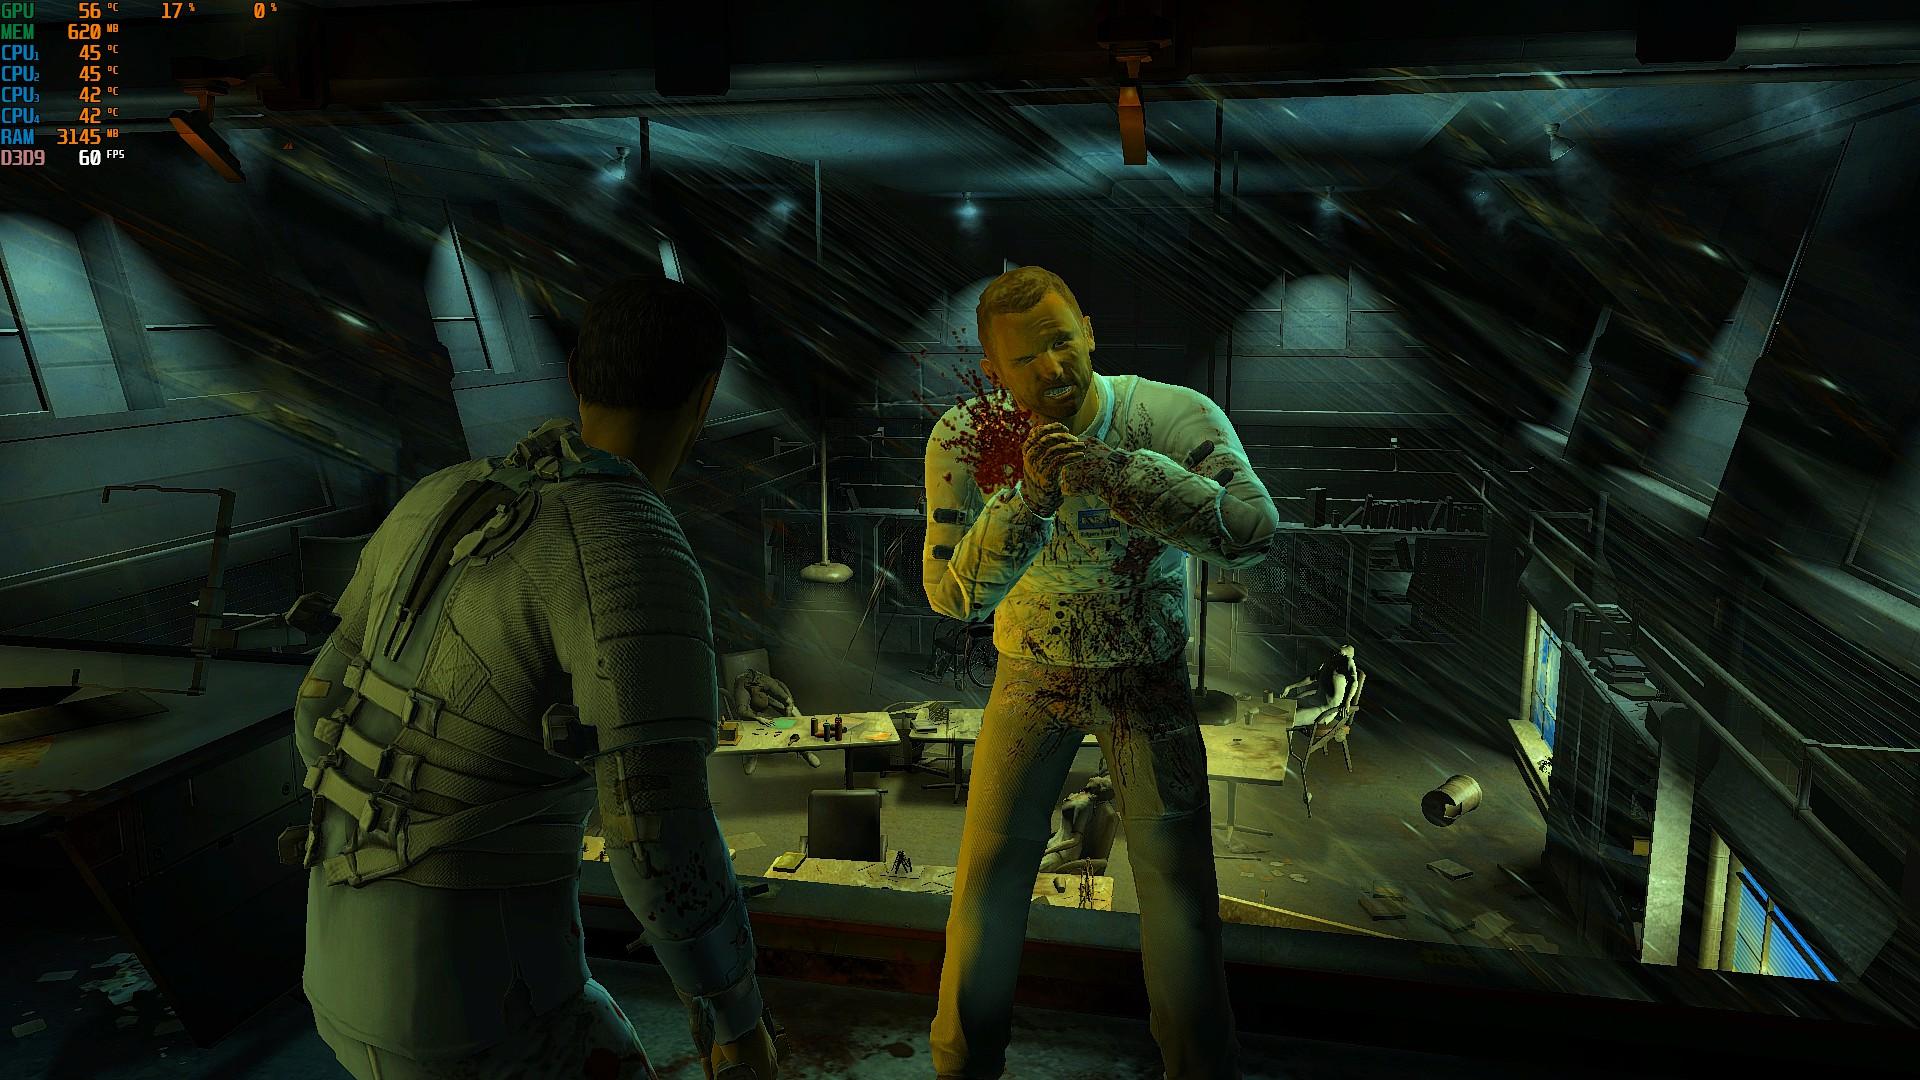 00020.Jpg - Dead Space 2